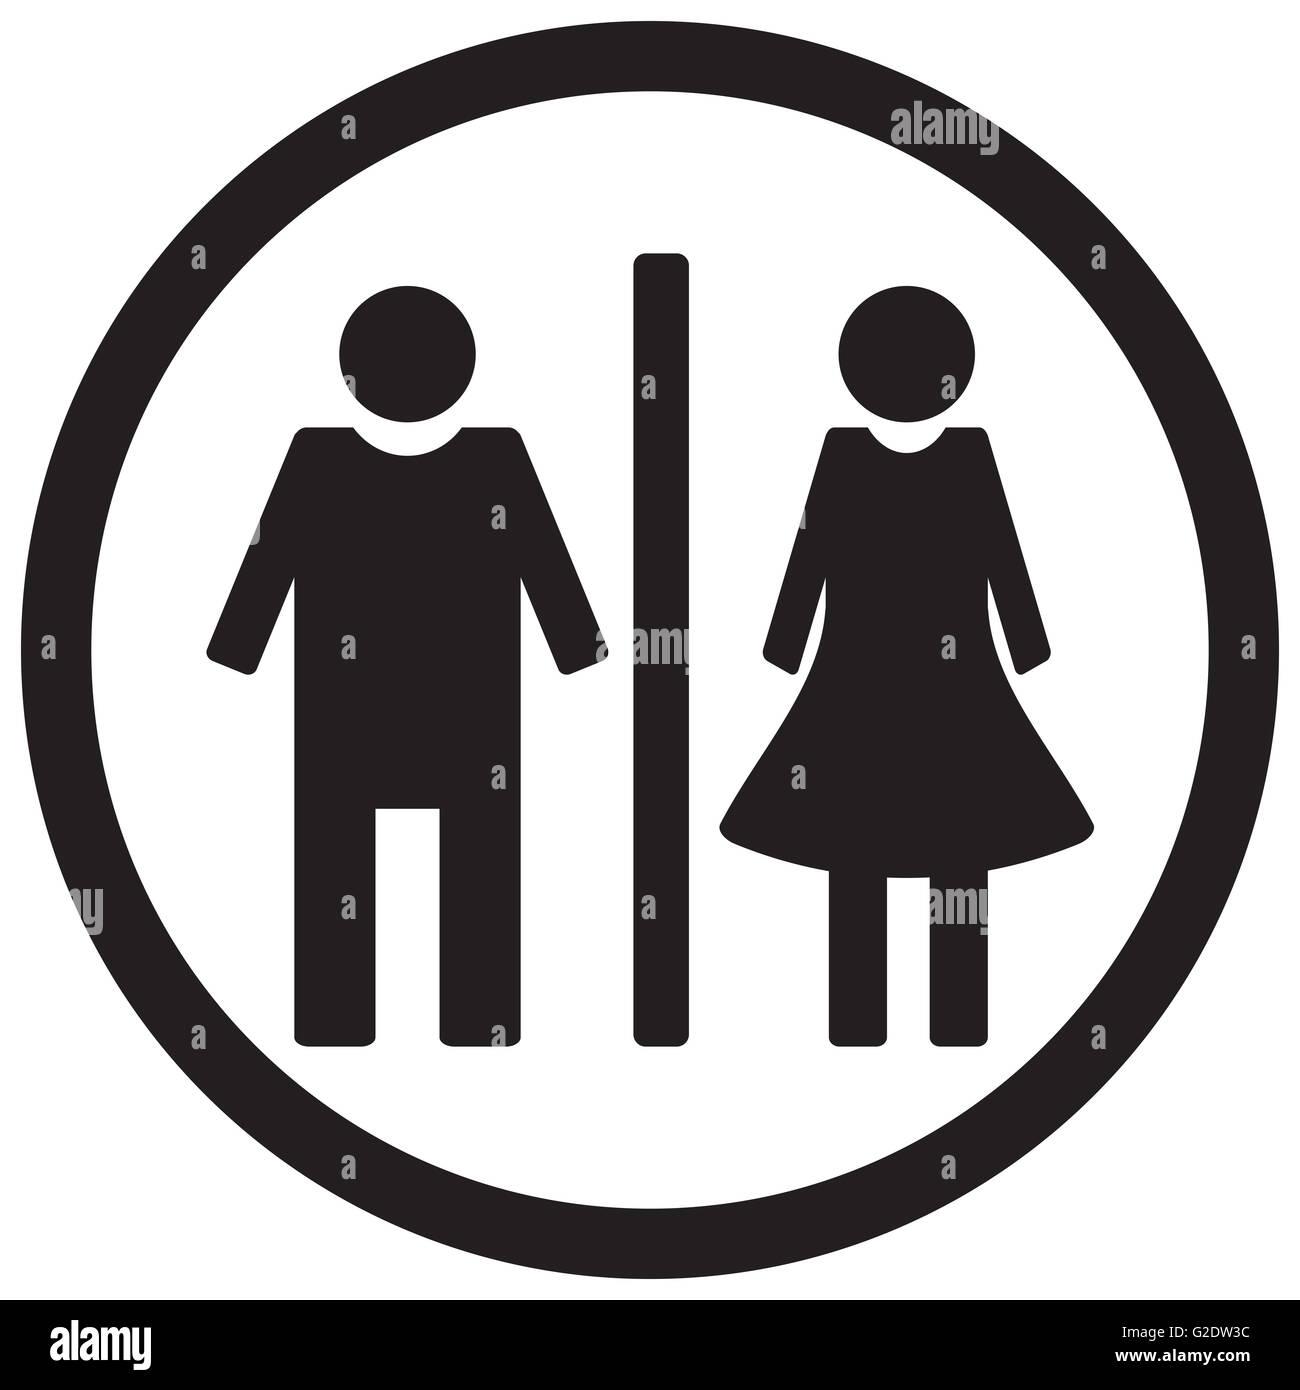 wc toilet icon gentleman restroom and lady bathroom vector stock